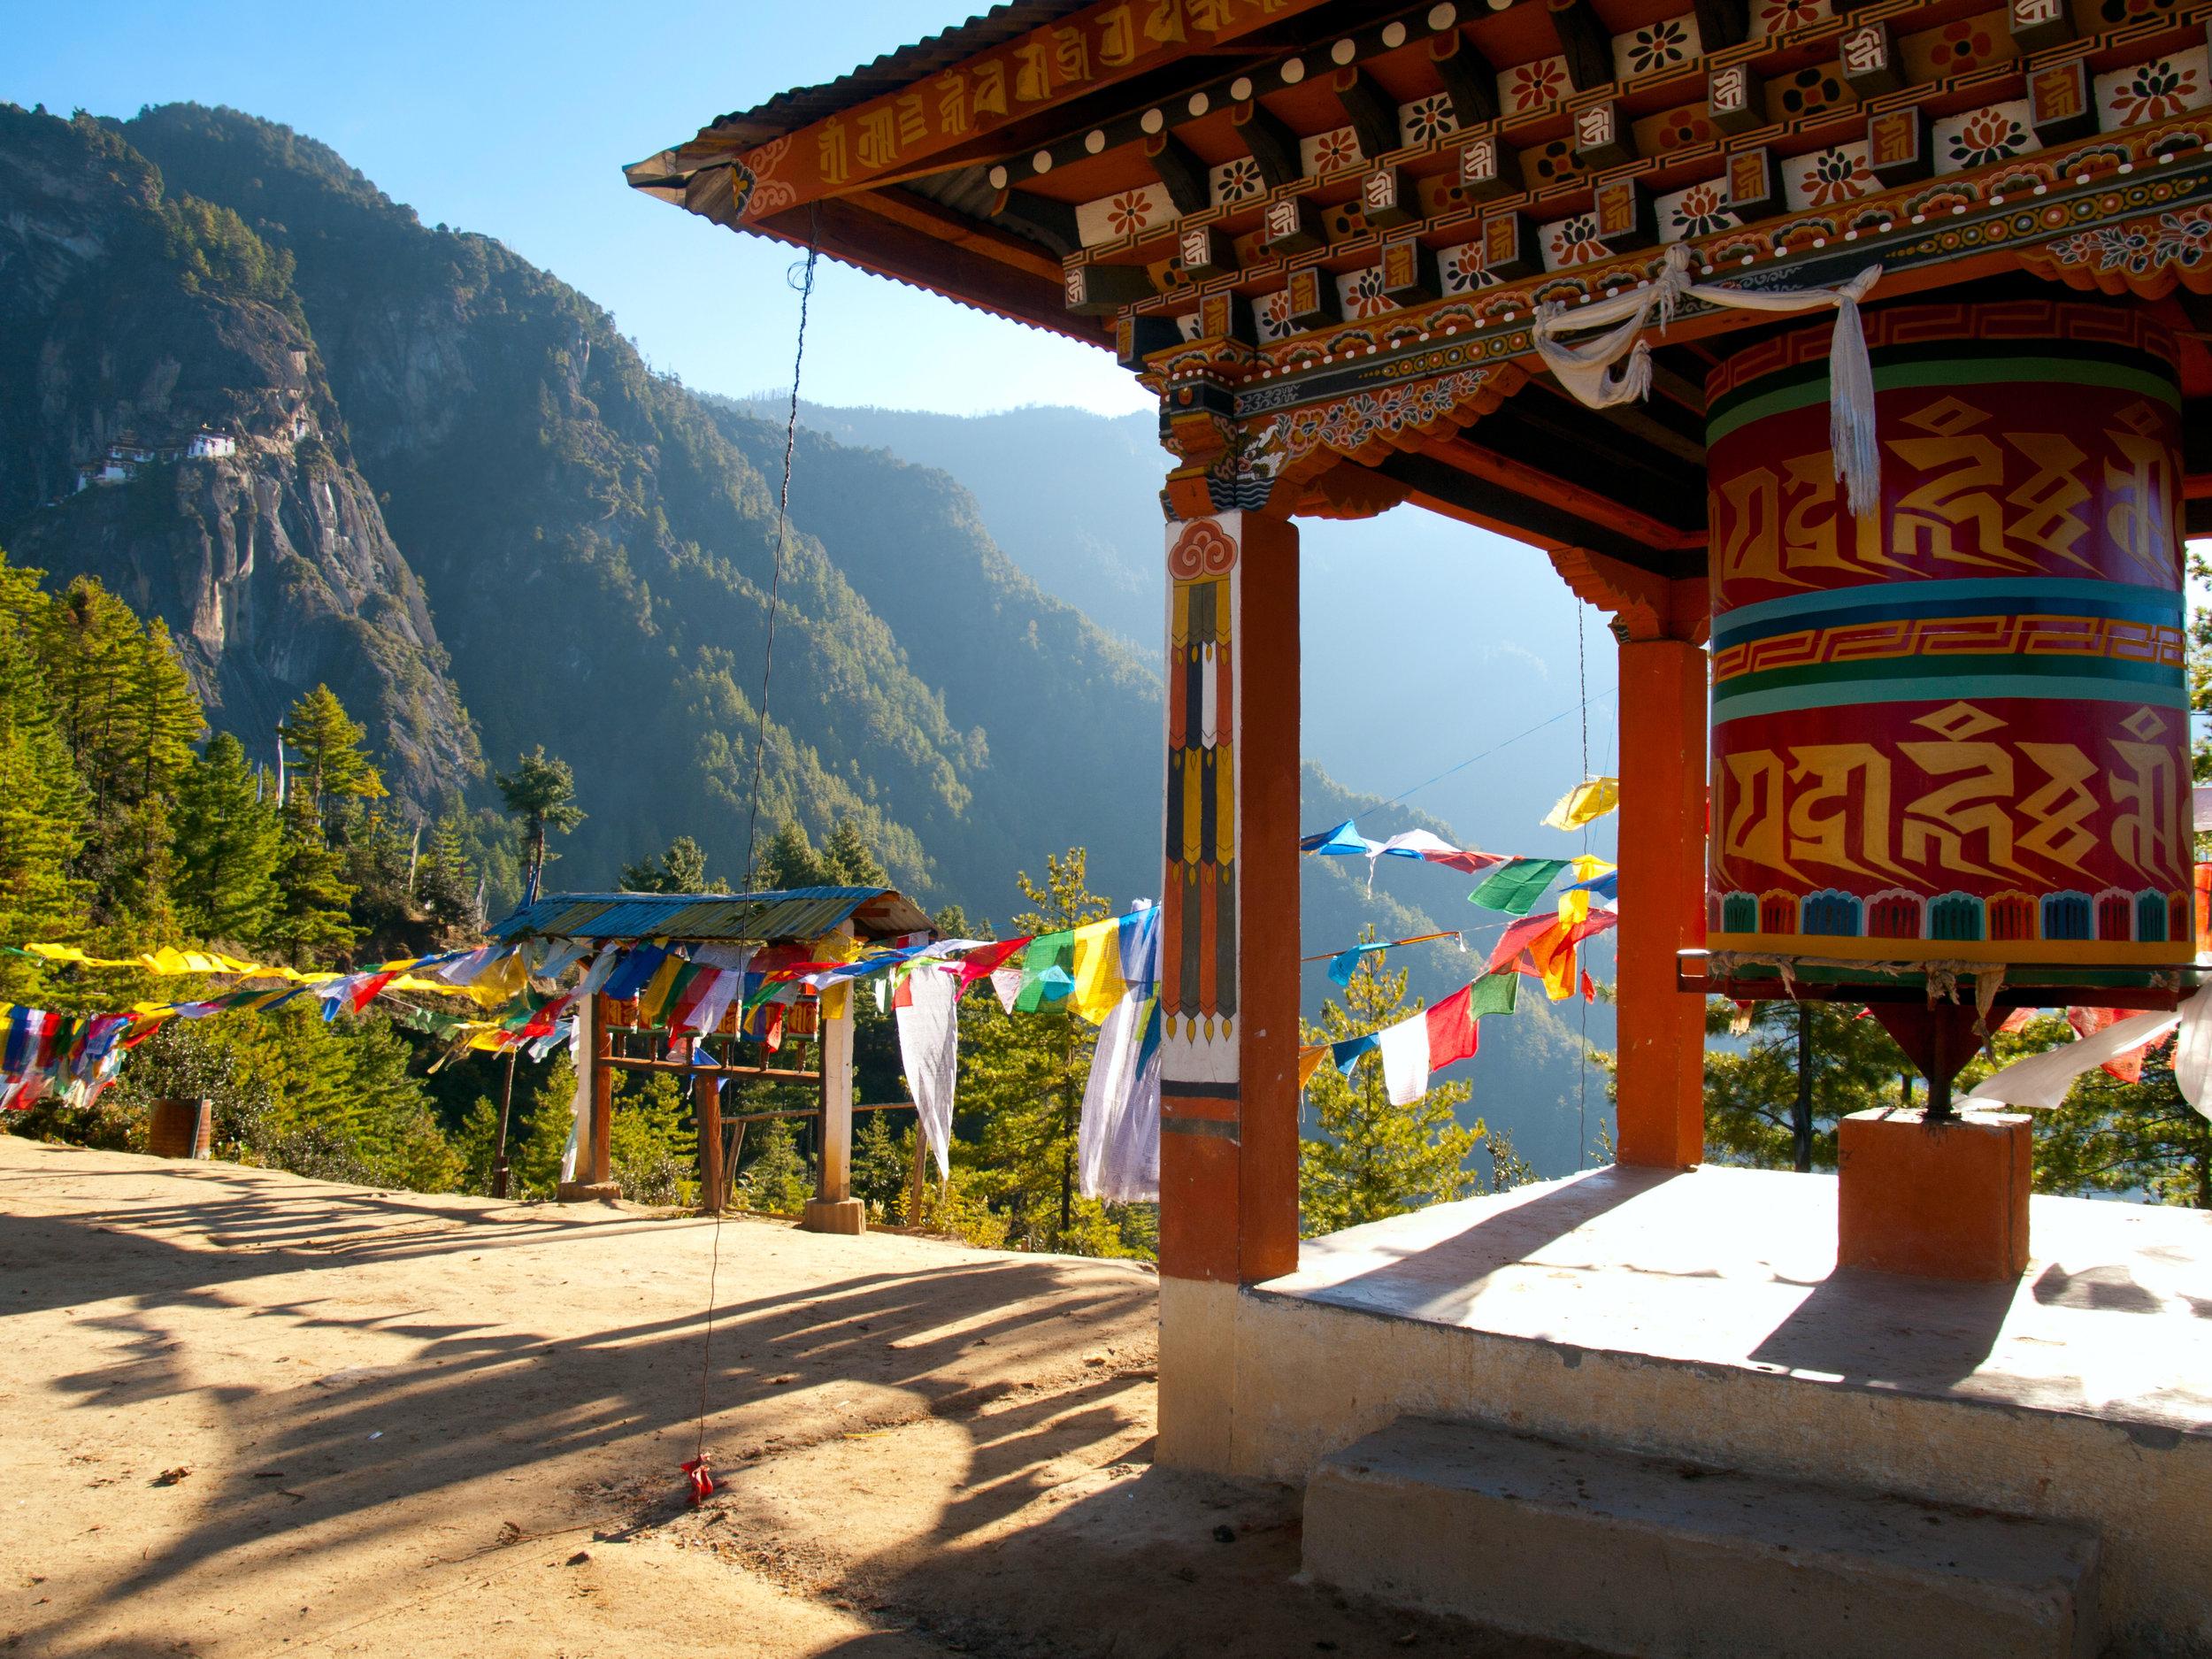 bhutan_bigstock-View-Of-The-Taktshang-Monaster-48535244.jpg